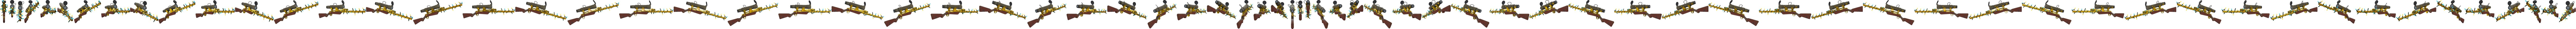 hight resolution of rj45 wall socket wiring diagram australium